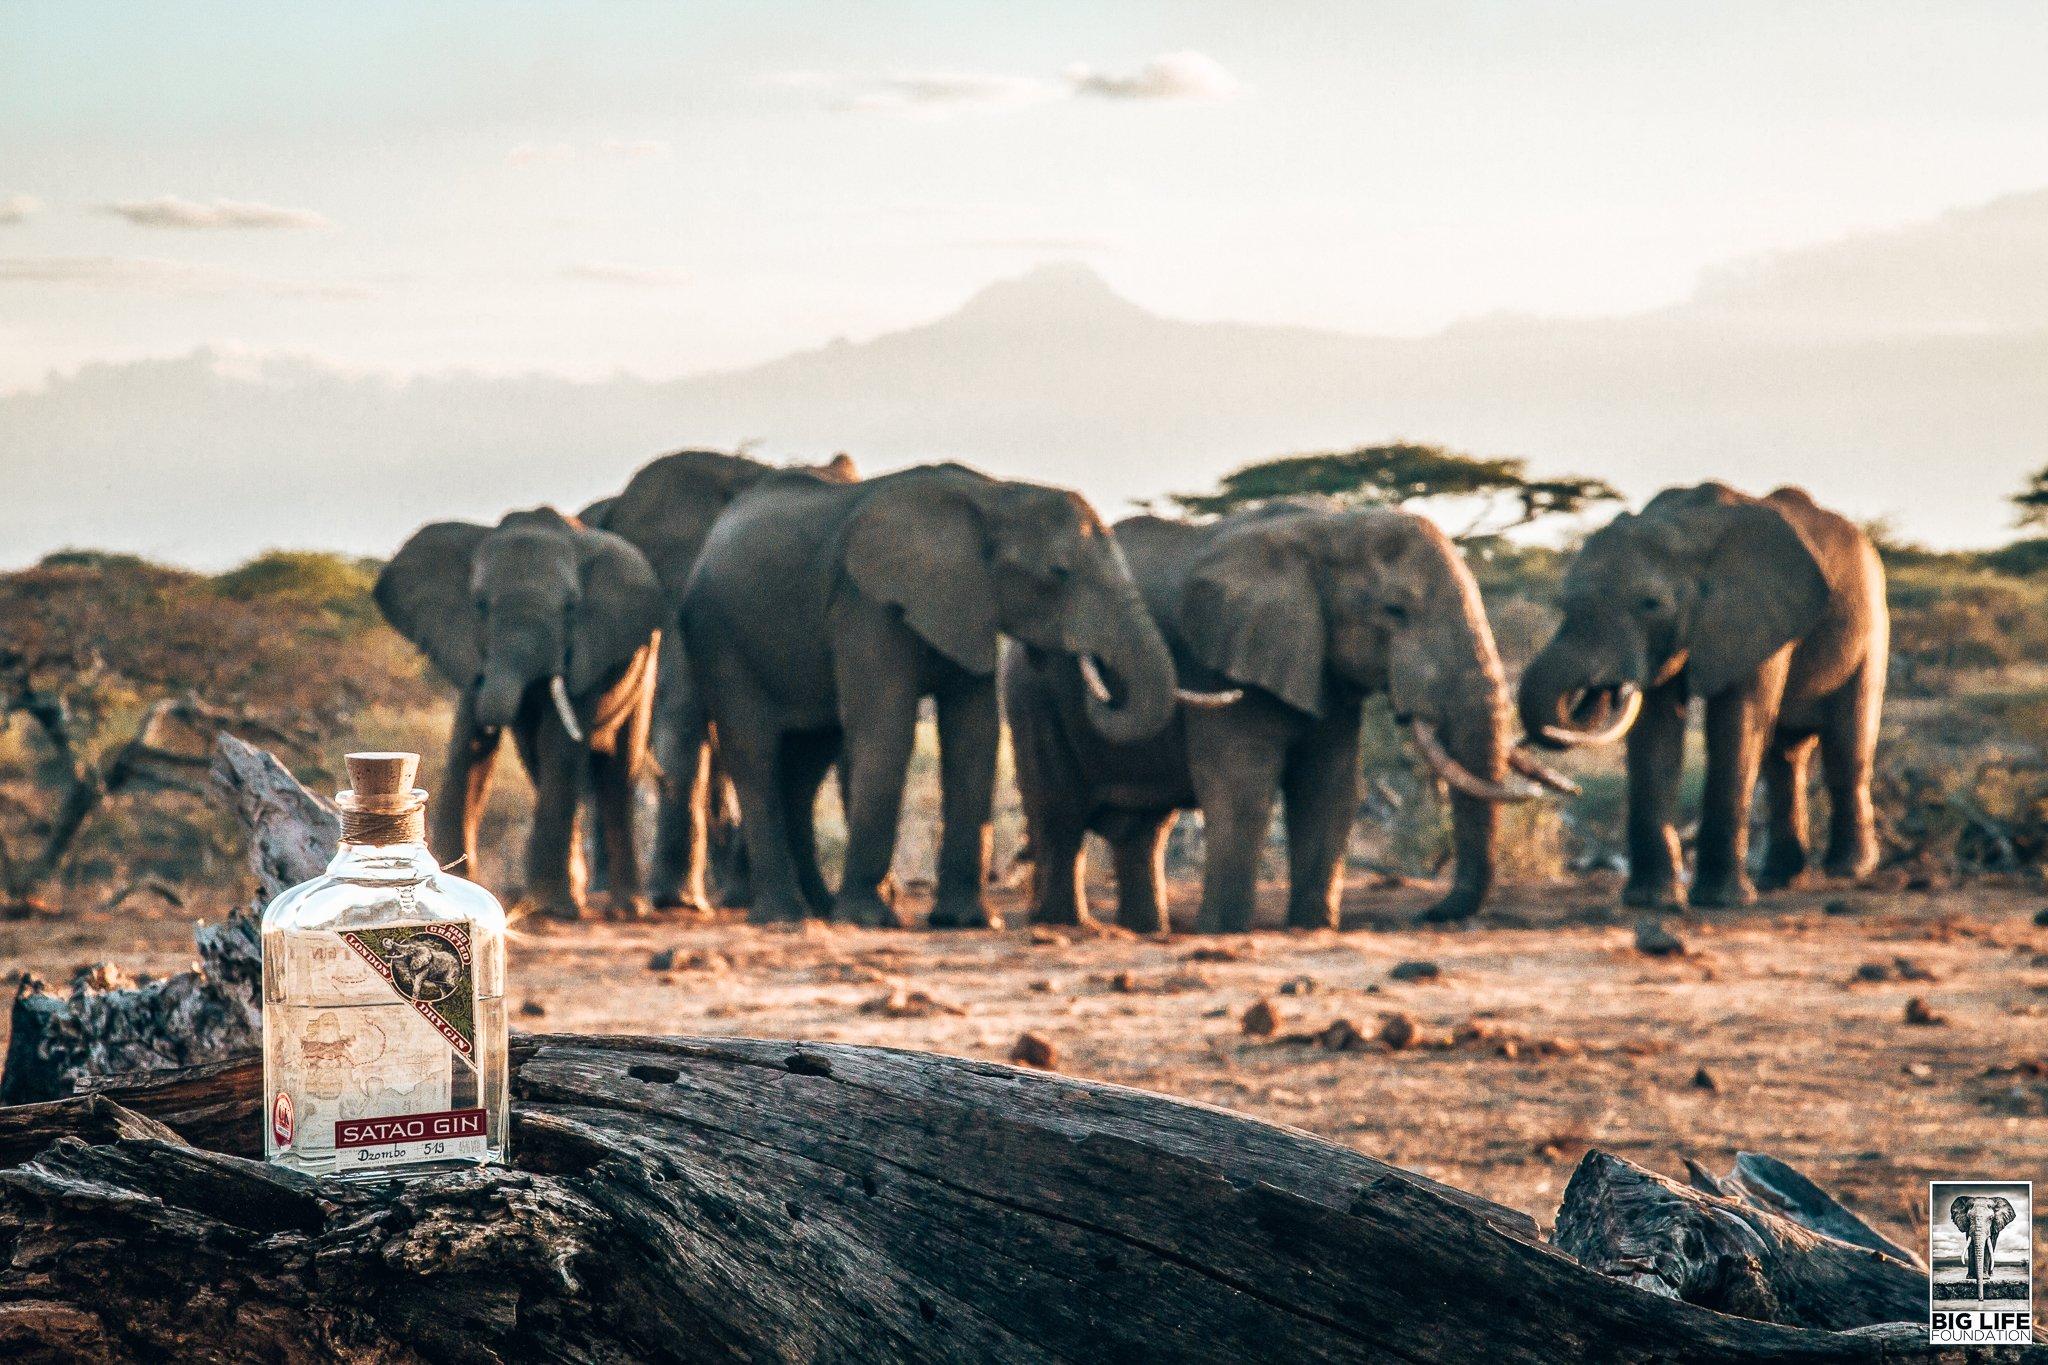 Satao Gin, Duitse gin met Afrikaanse roots, Alles over gin.